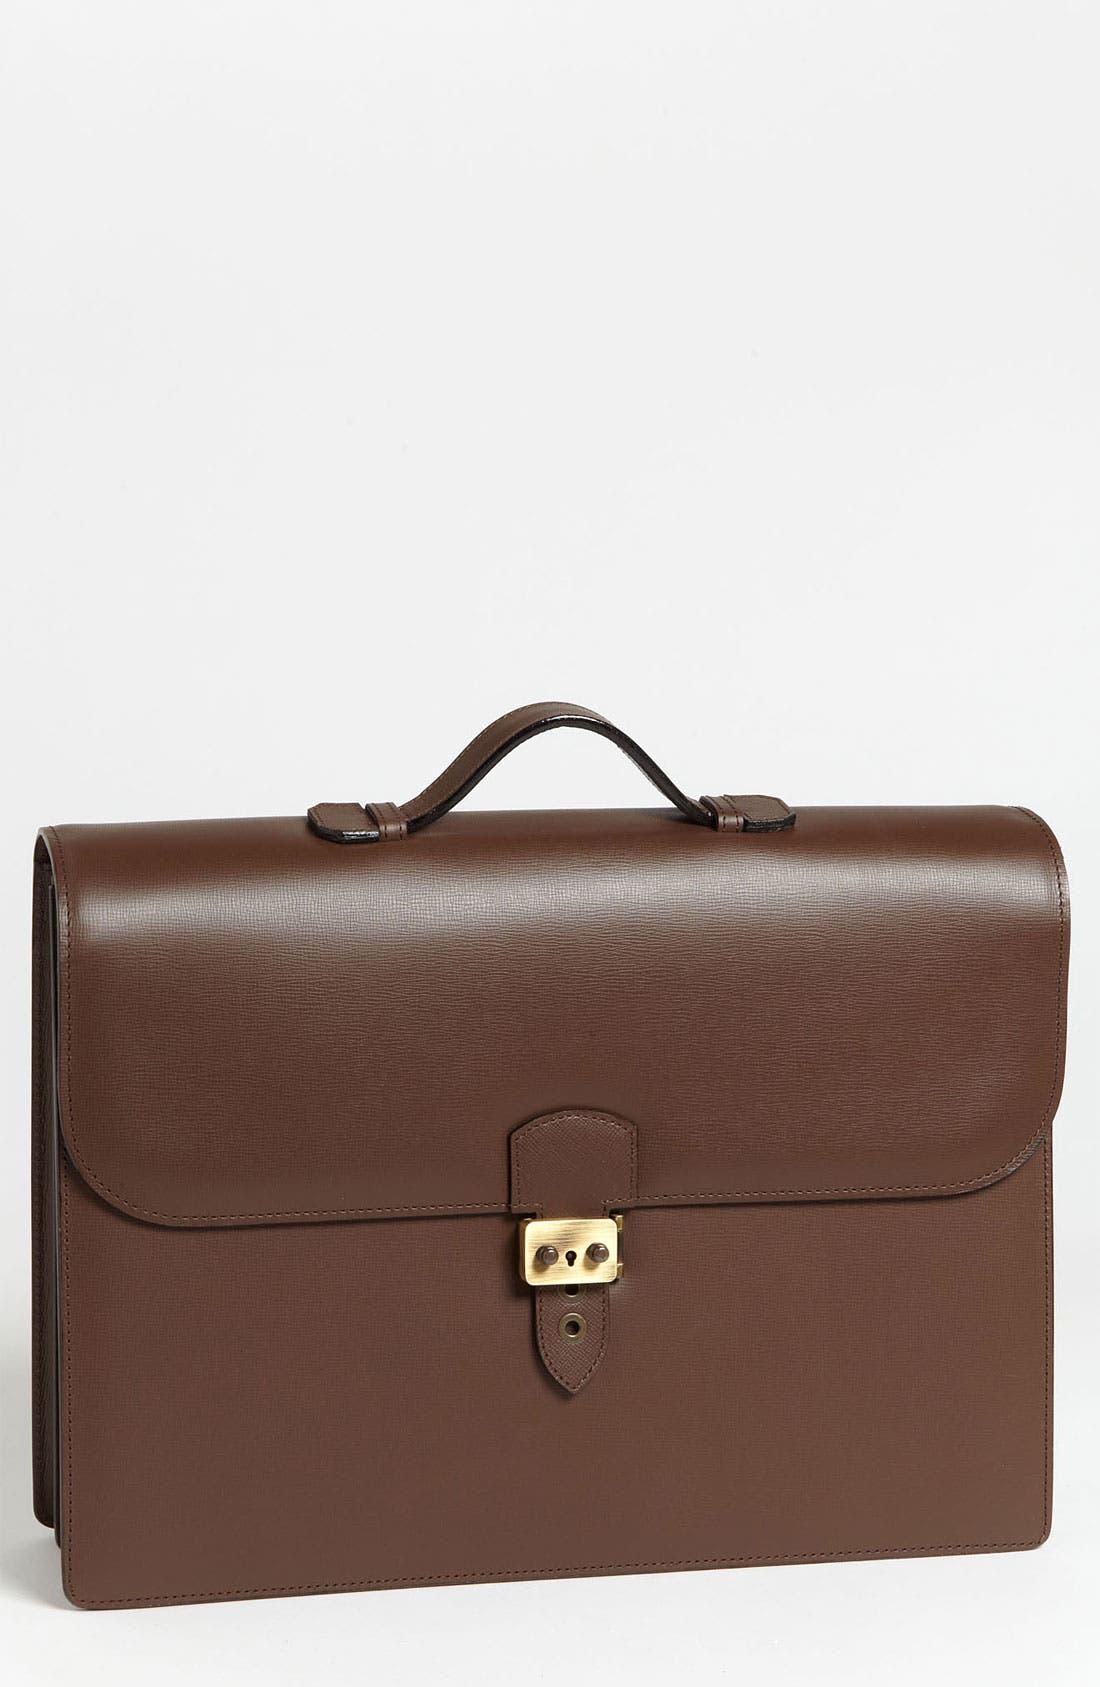 Alternate Image 1 Selected - Bruno Magli 'Androya' Briefcase